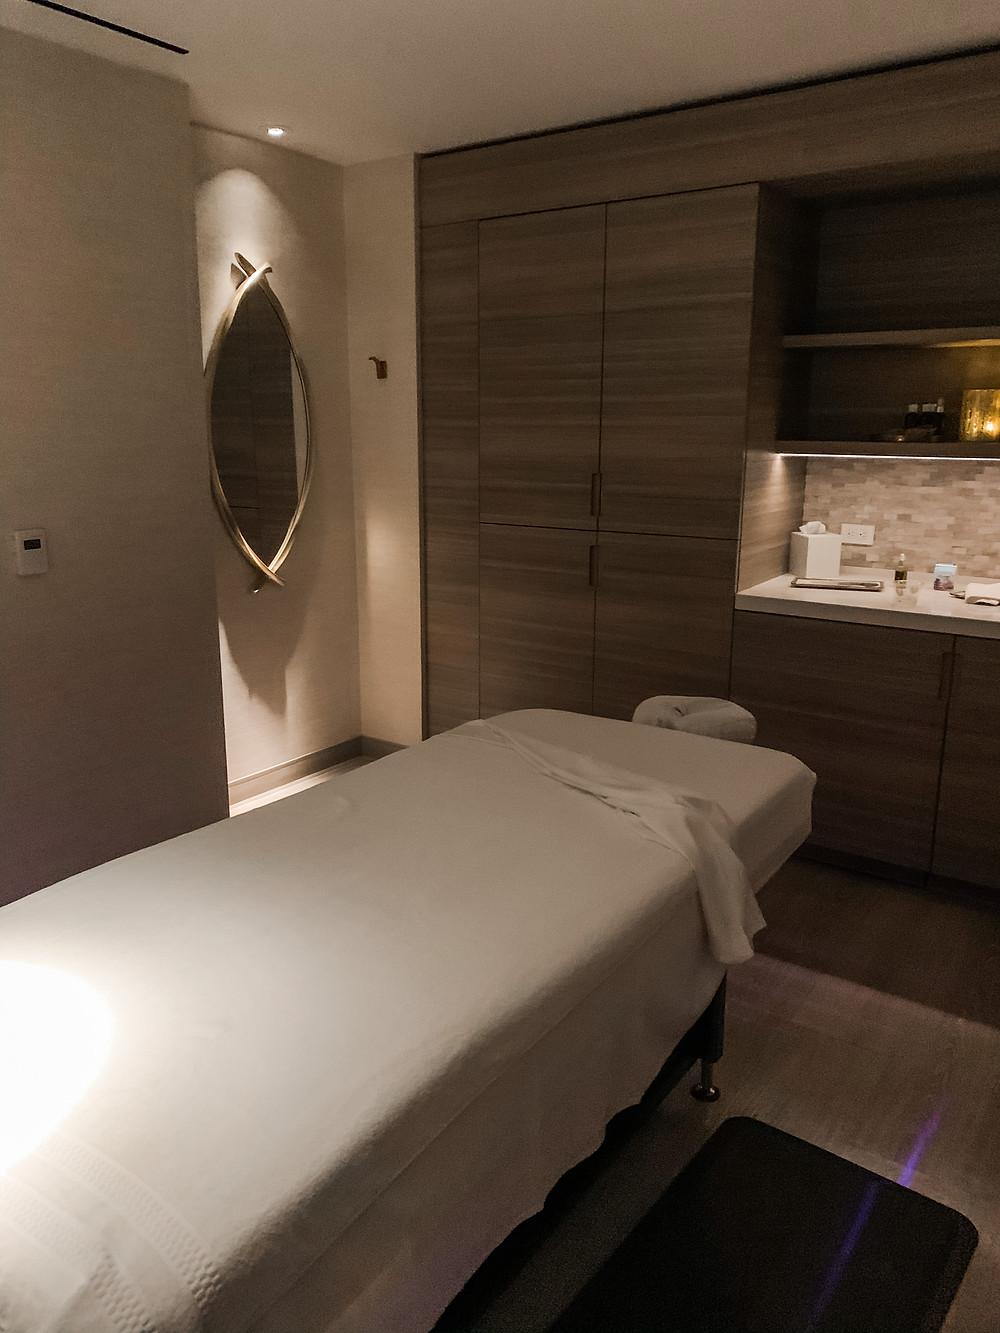 The Phoenician Resort Scottsdale Arizona Spa Massage Room